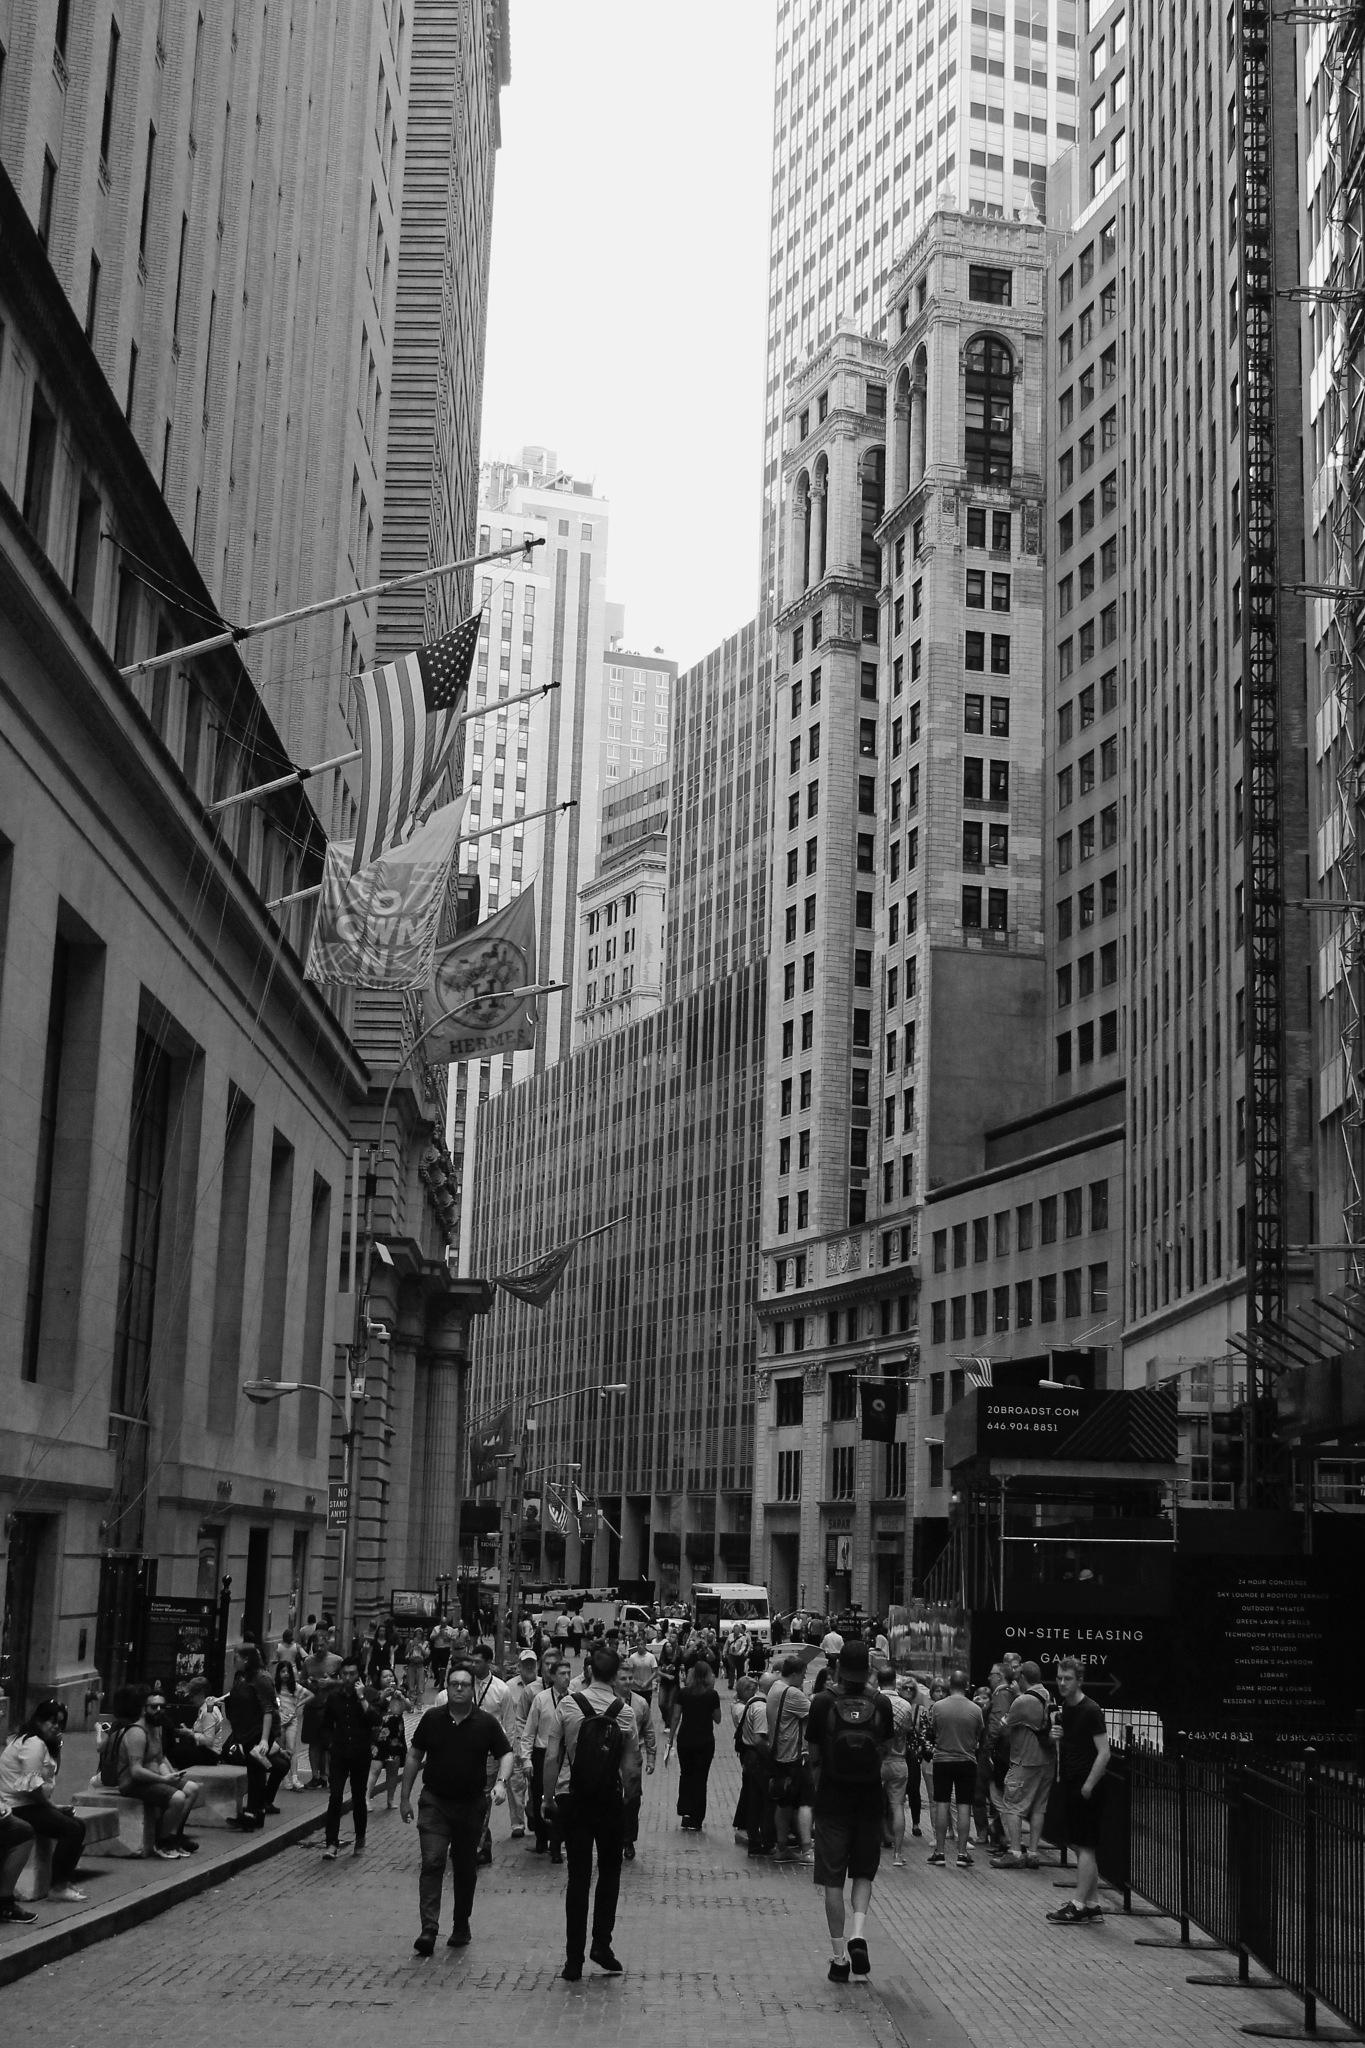 New Yorkers by Iain Adrejilo